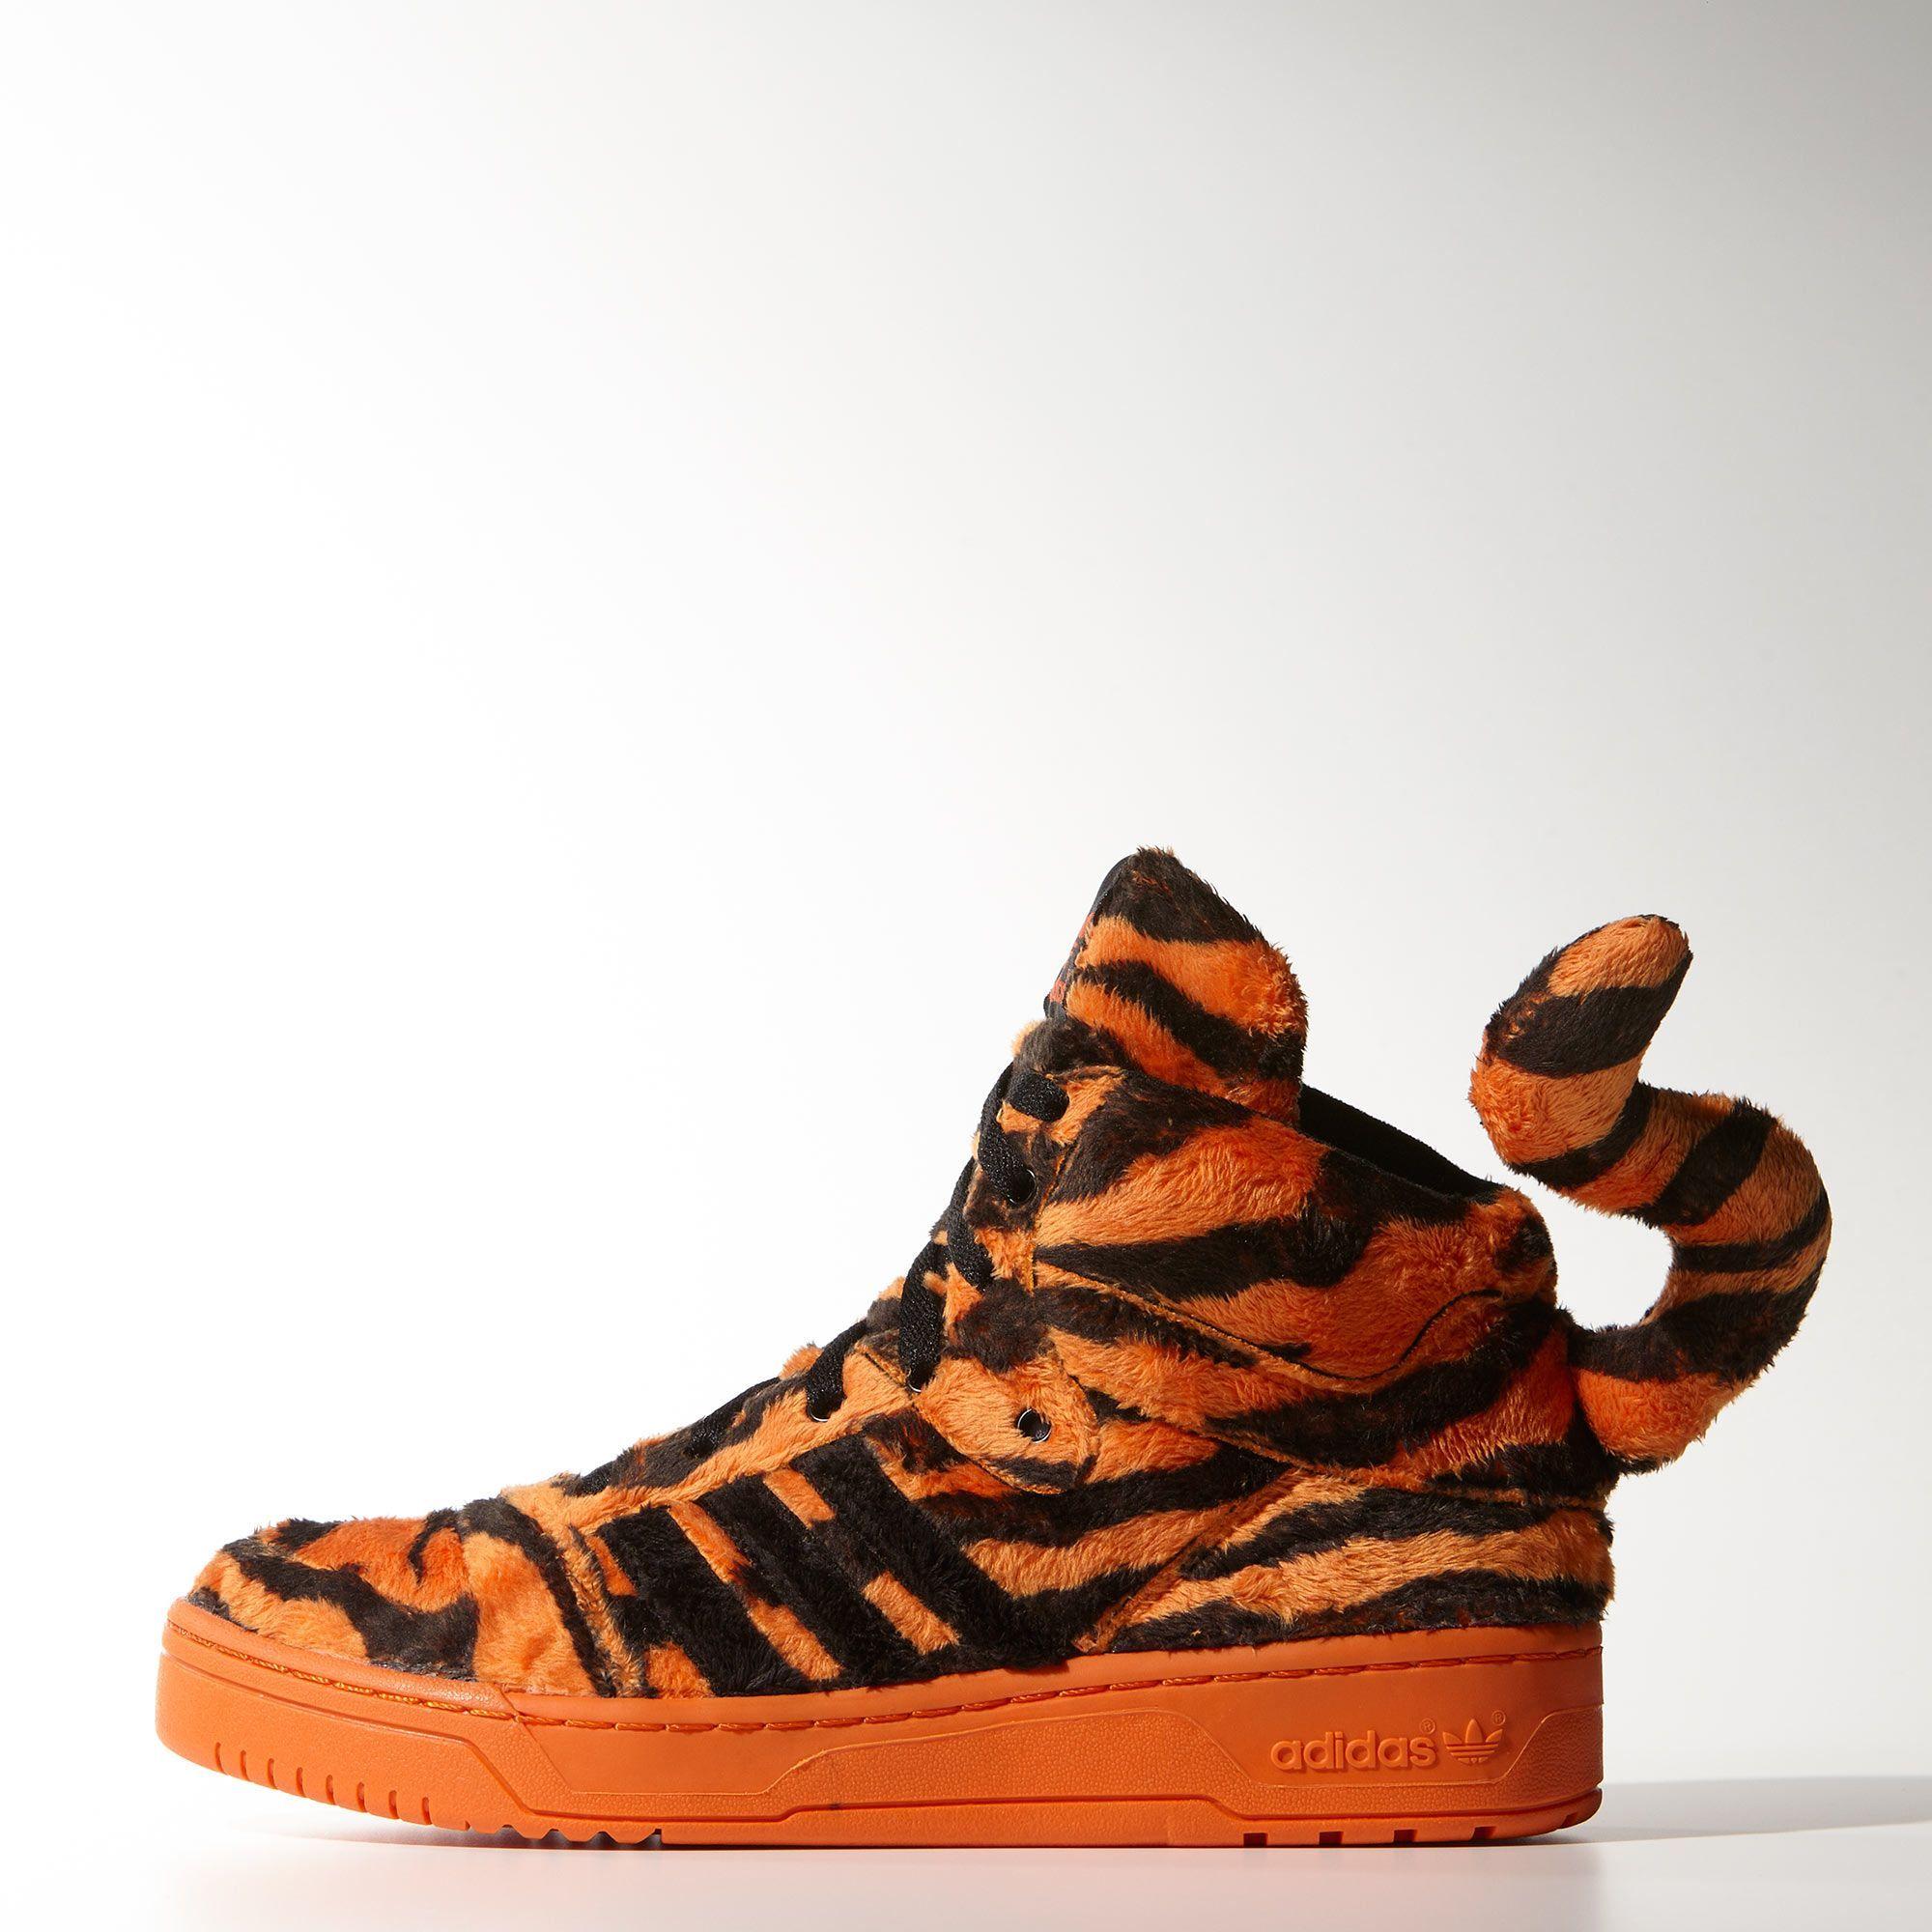 Divertente!Adidas Jeremy Canada Scott Tigre Scarpe Adidas Canada Jeremy Stile 47eebf